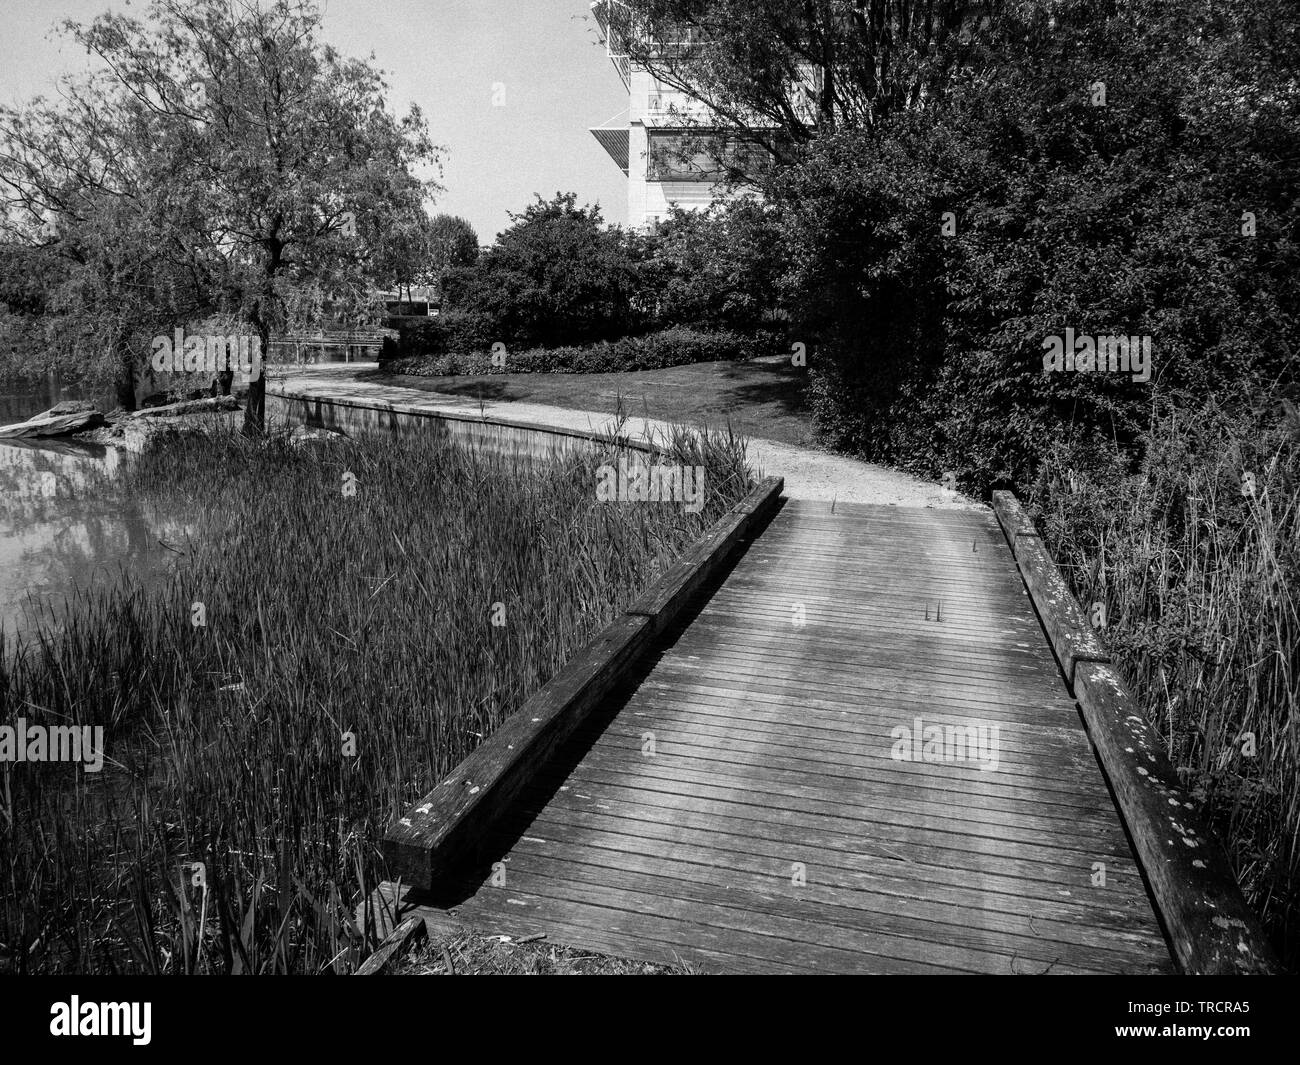 Walkway Threw Reedbed, With Office Buildings, Stockley Park, Harlington, Uxbridge - Stock Image